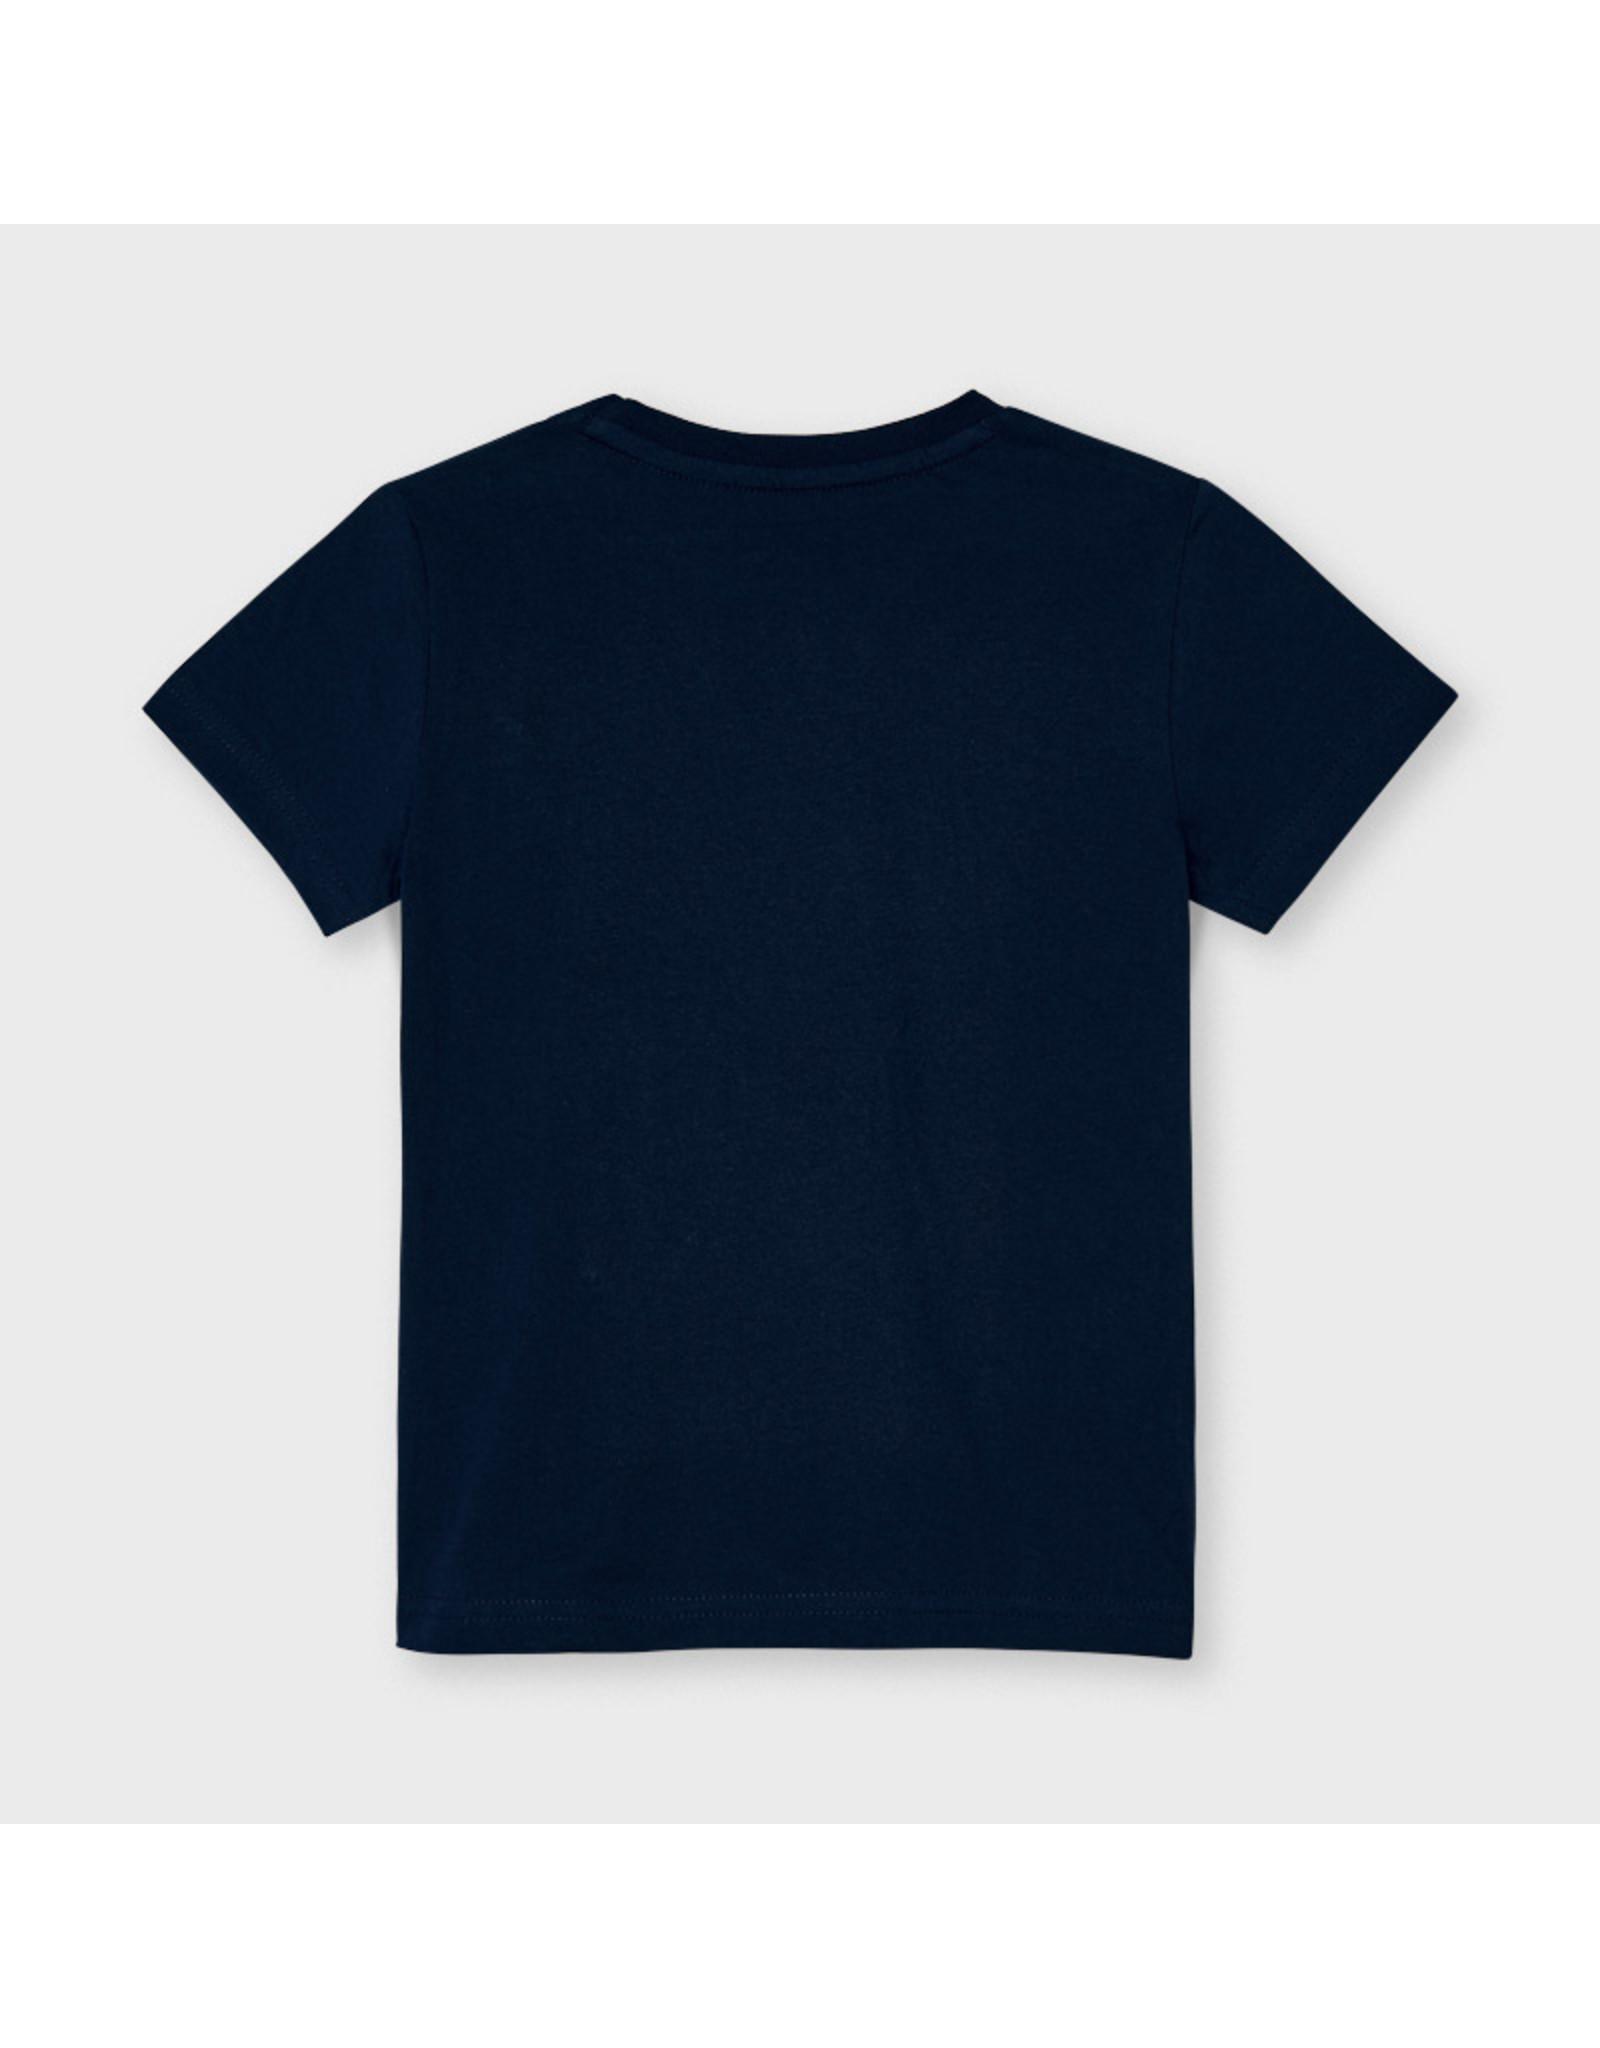 Mayoral s/s skater t-shirt  Navy